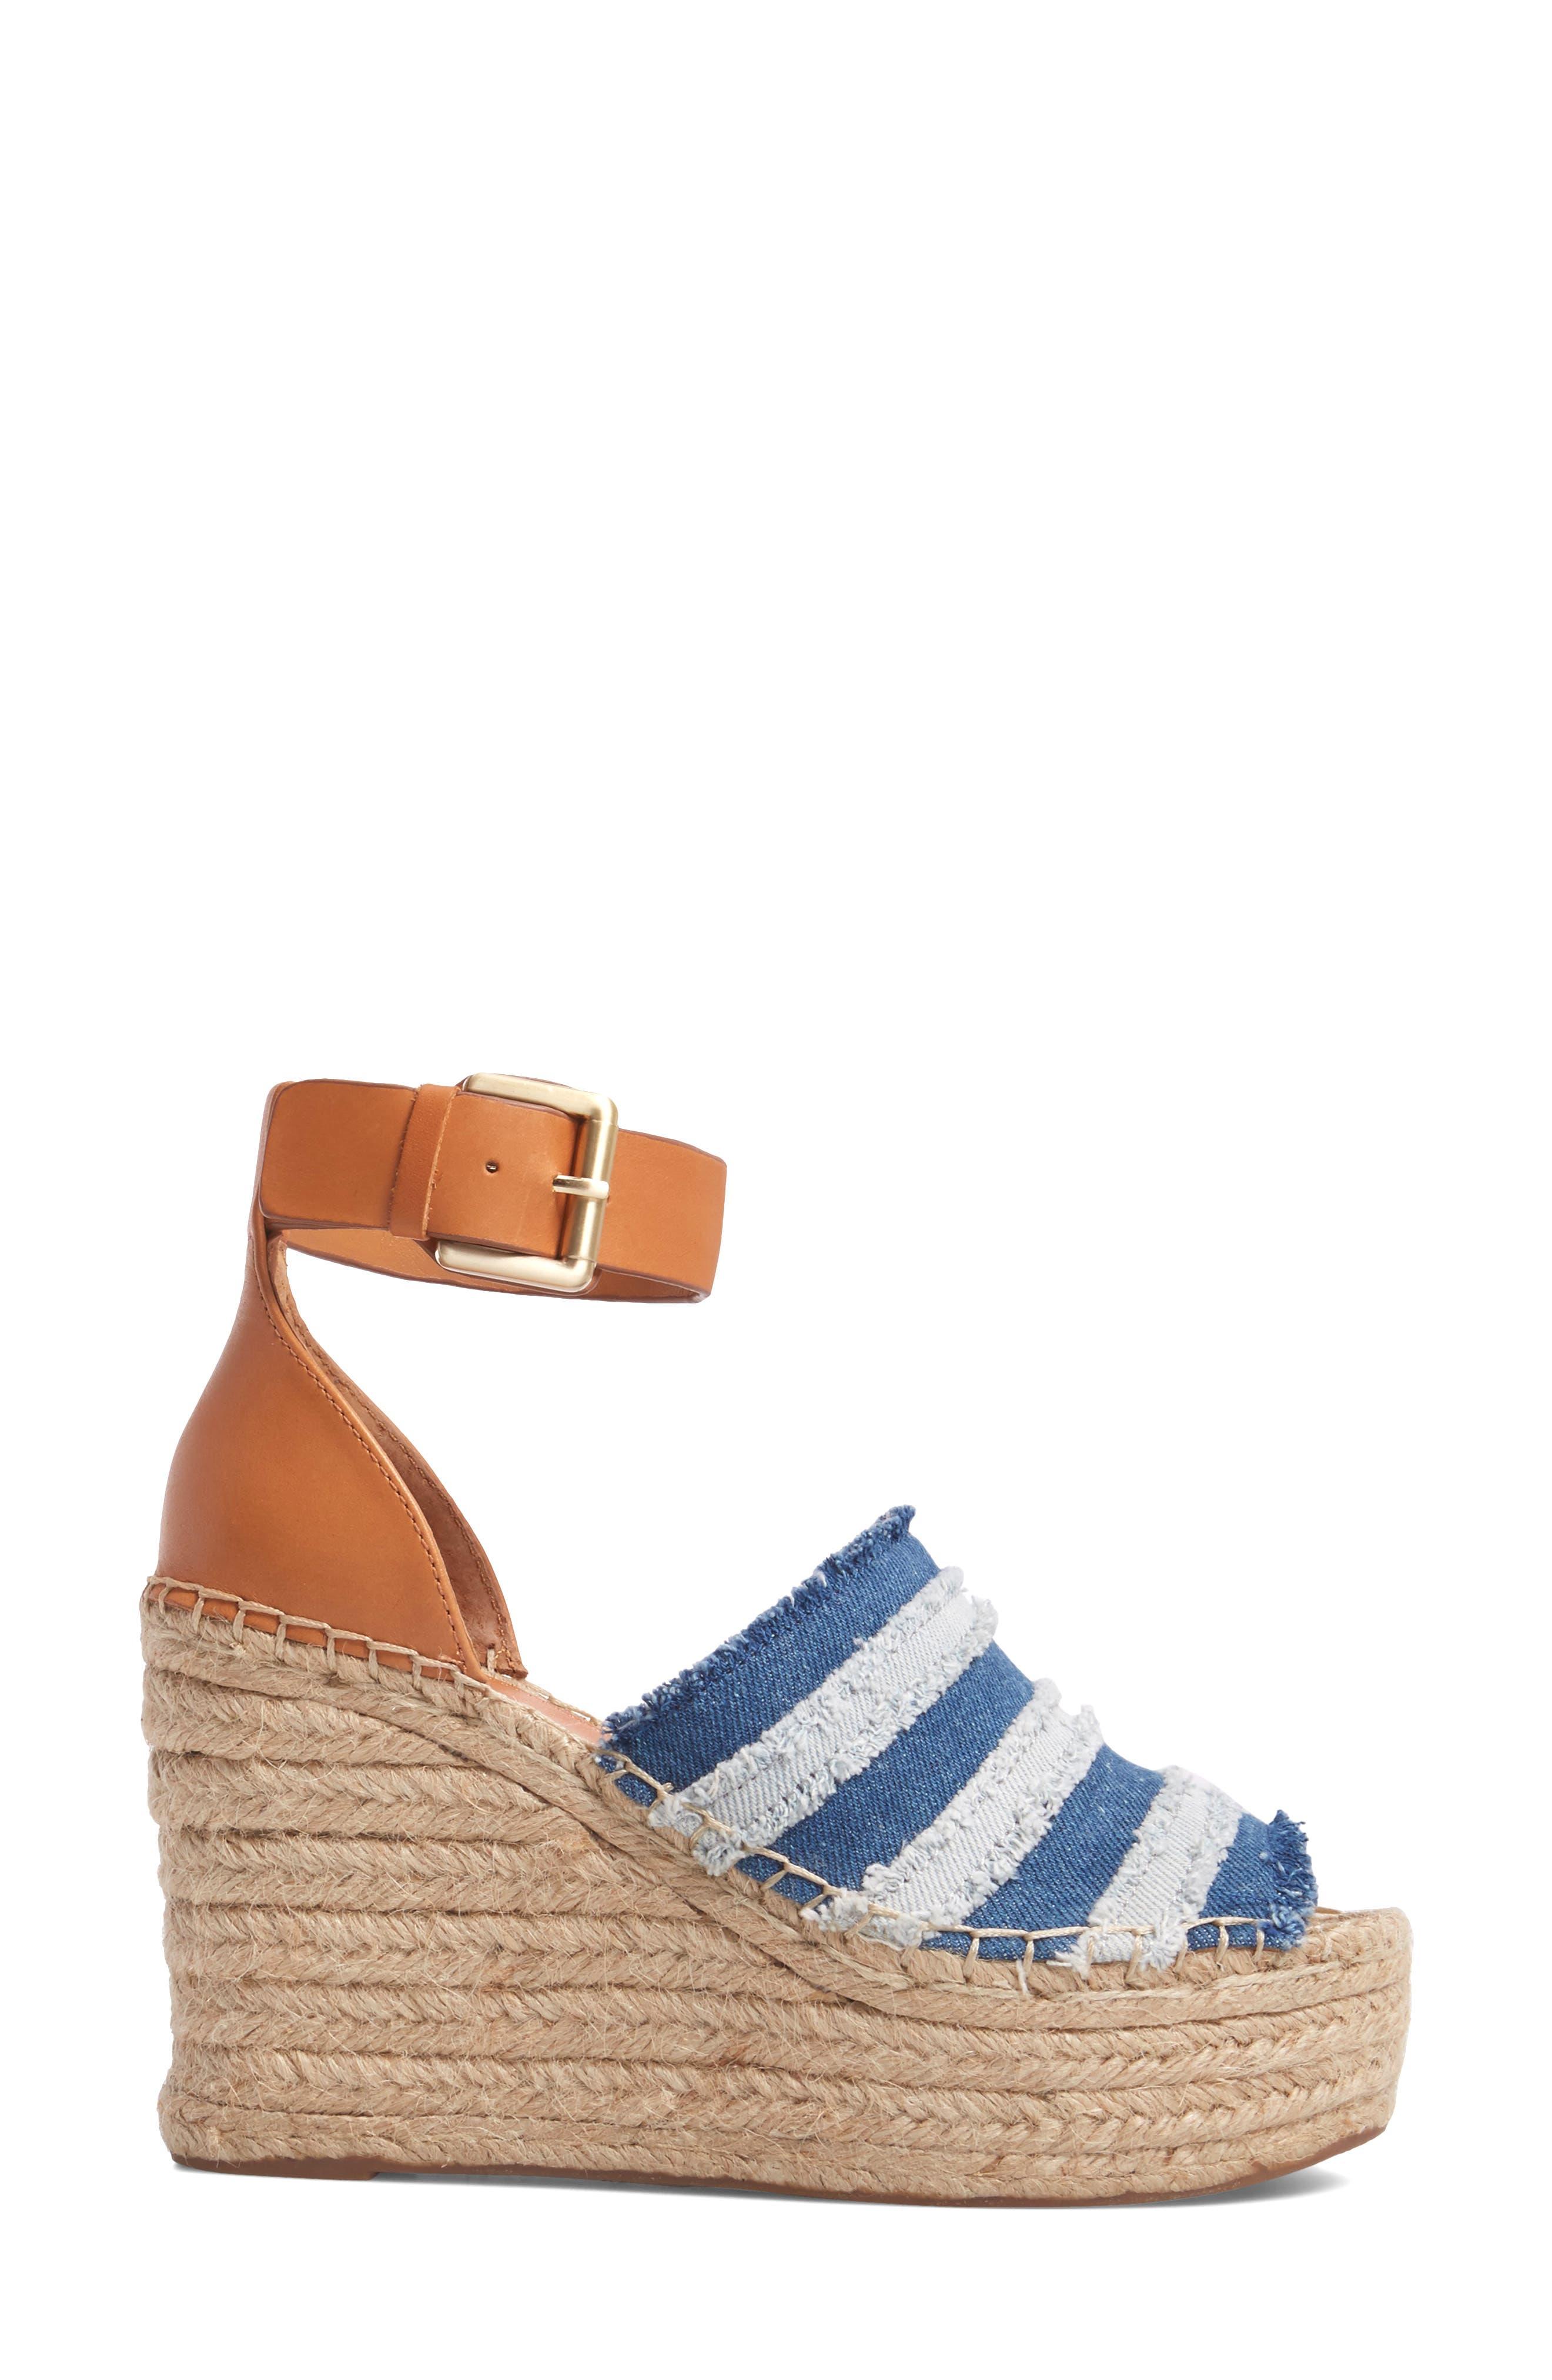 Adria Wedge Sandal,                             Alternate thumbnail 3, color,